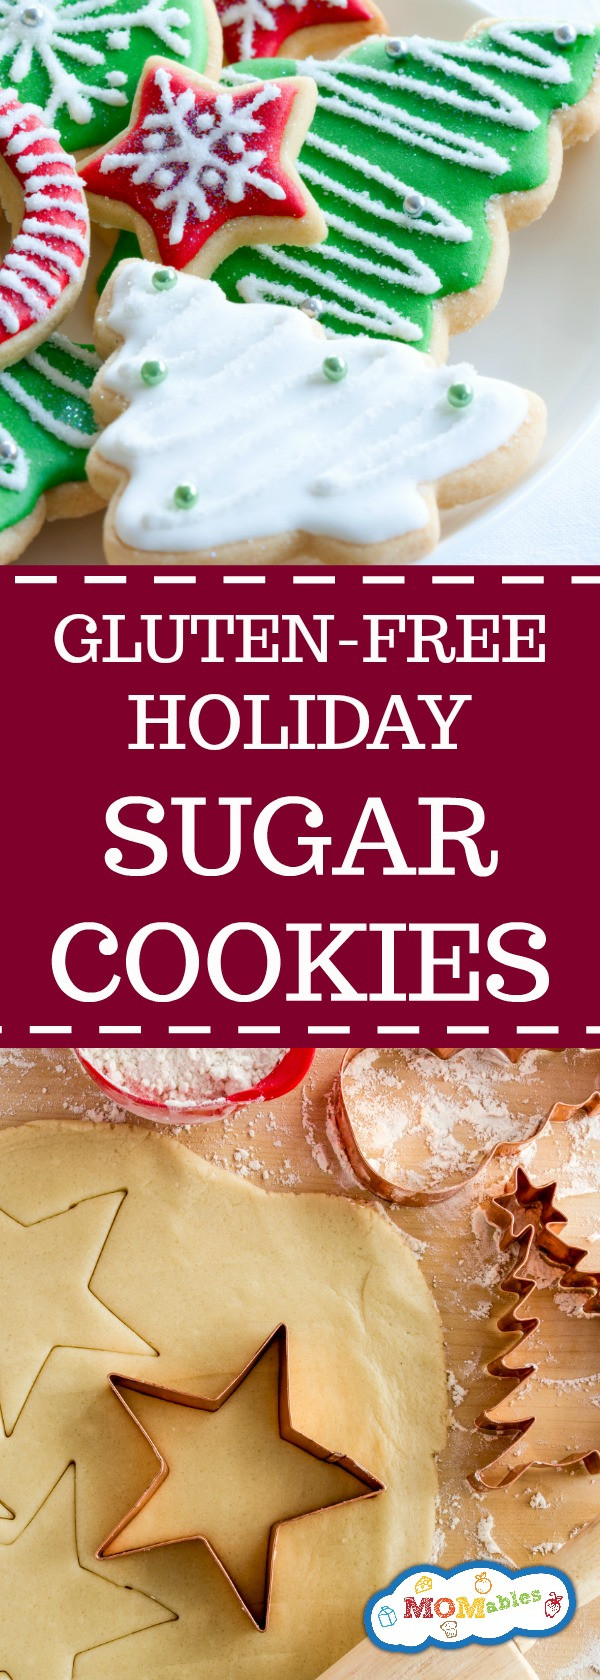 Gluten Free Sugar Cookie Recipes  Gluten Free Sugar Cookie Recipe